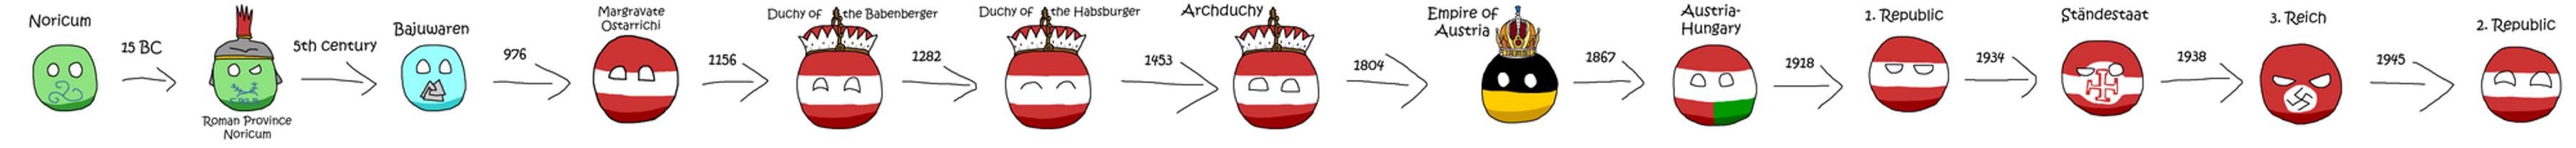 Austria Evolution countryball by Arminius1871